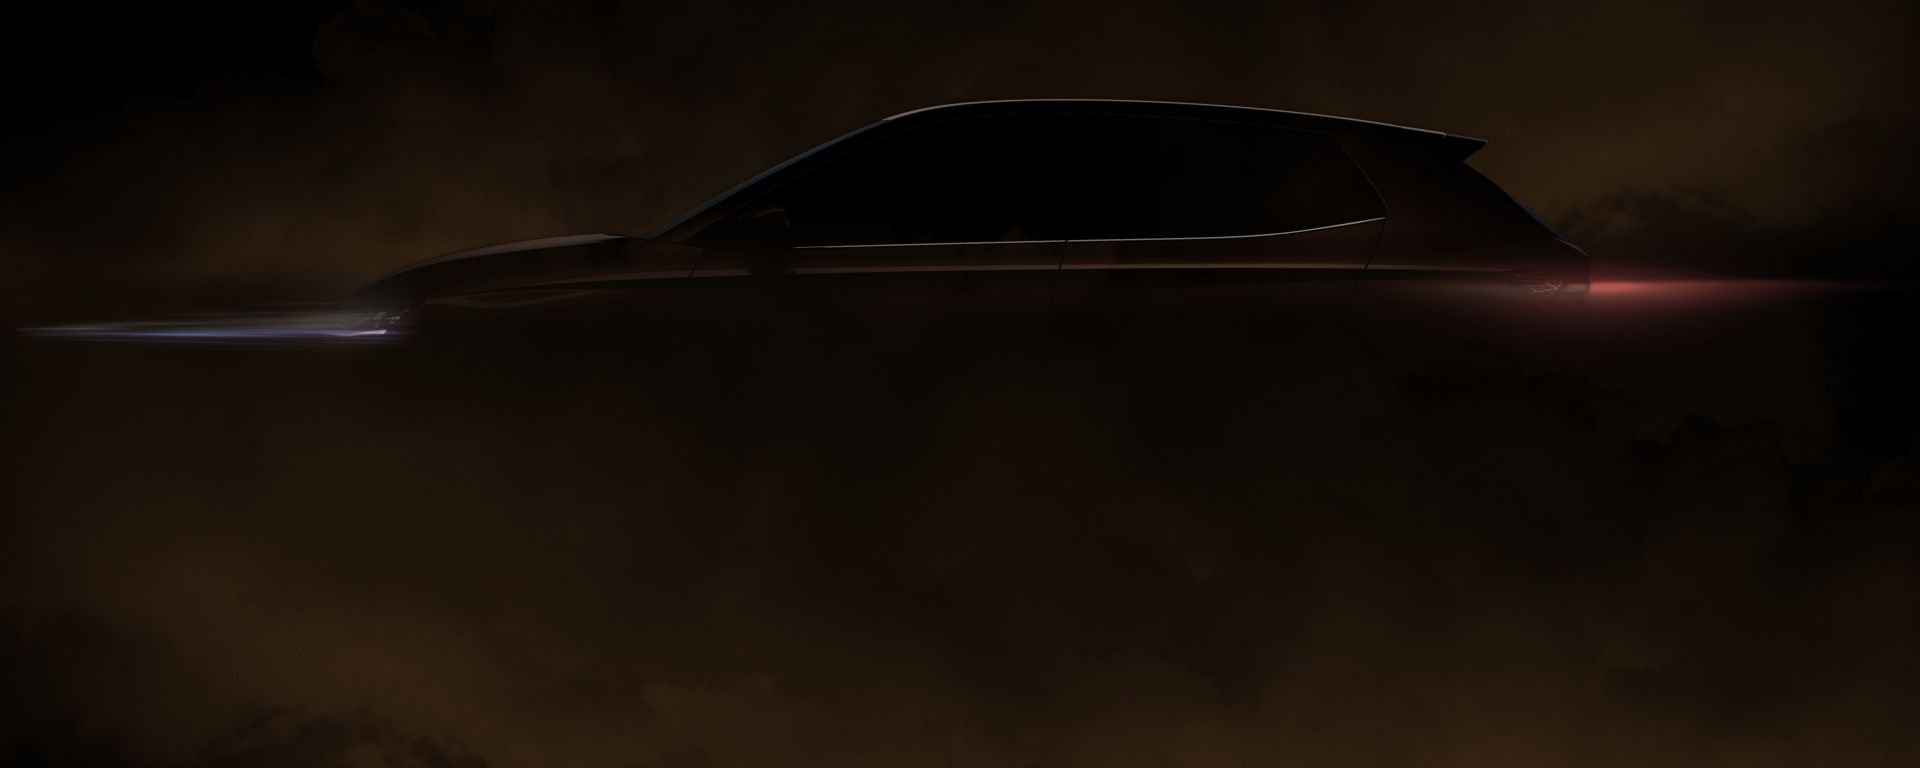 Nuova Skoda Fabia 2021: la prima immagine teaser